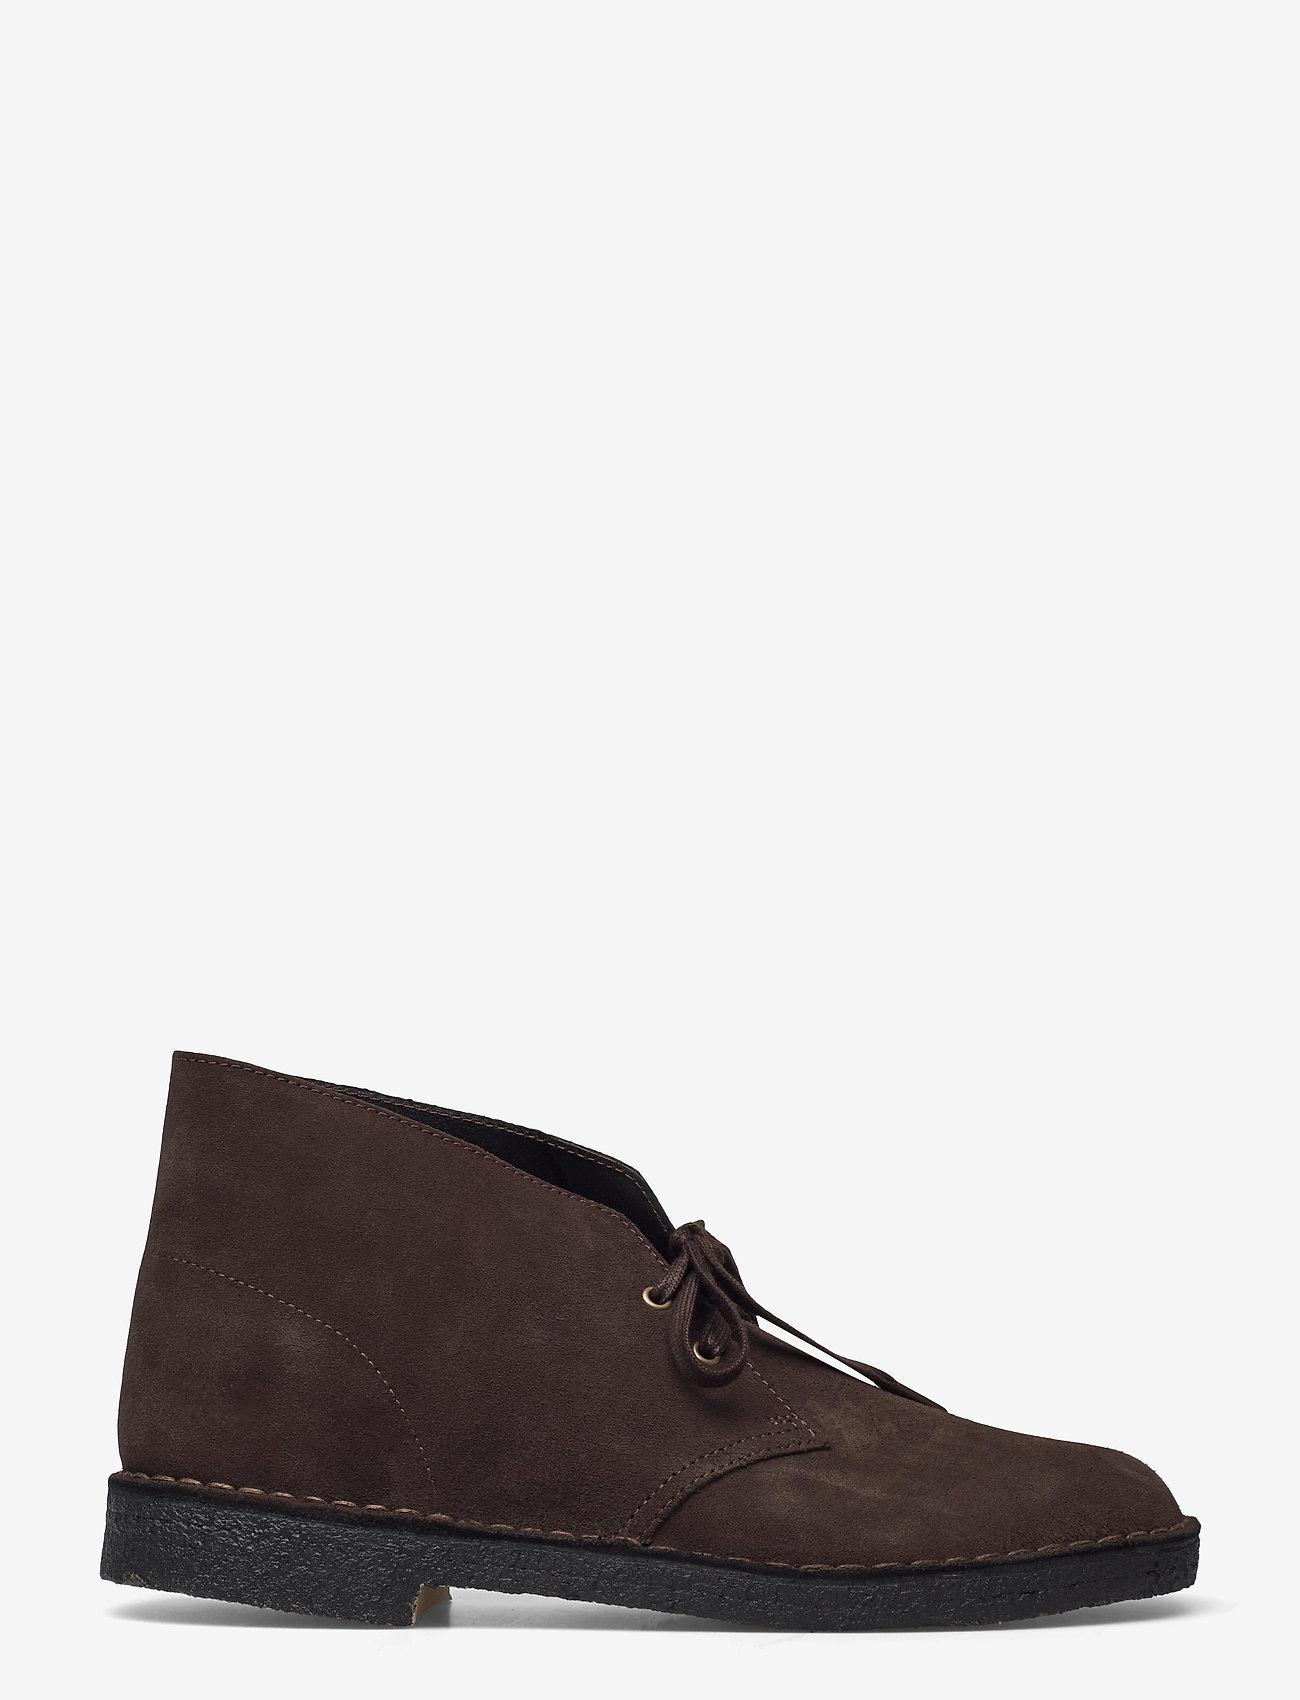 Clarks Originals - Desert Boot - Ökenkängor - brown sde - 1